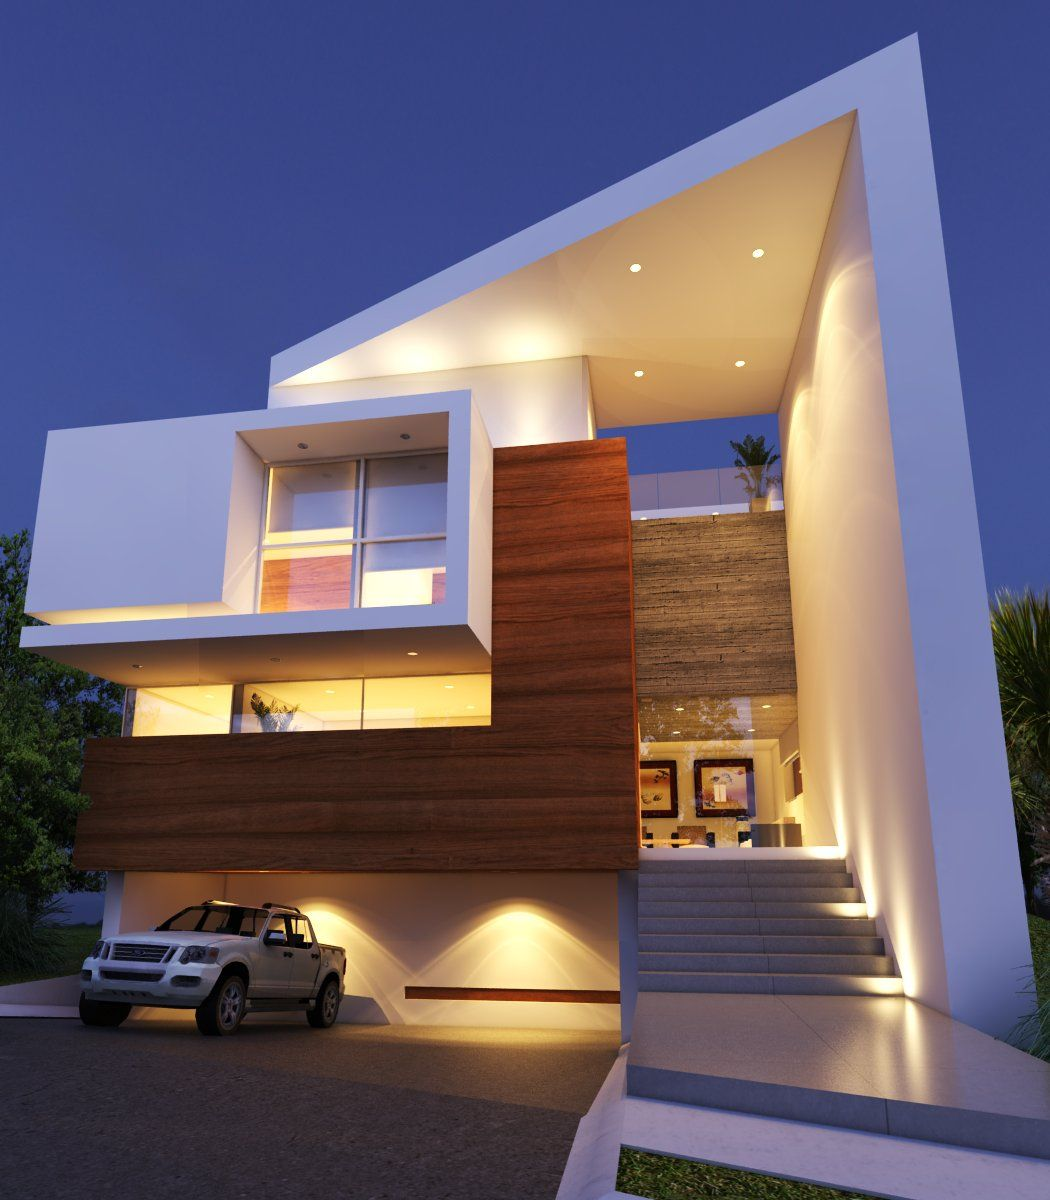 Residencias fachadas guadalajara creato por creato arquitectos places pinterest - Casas cuadradas modernas ...